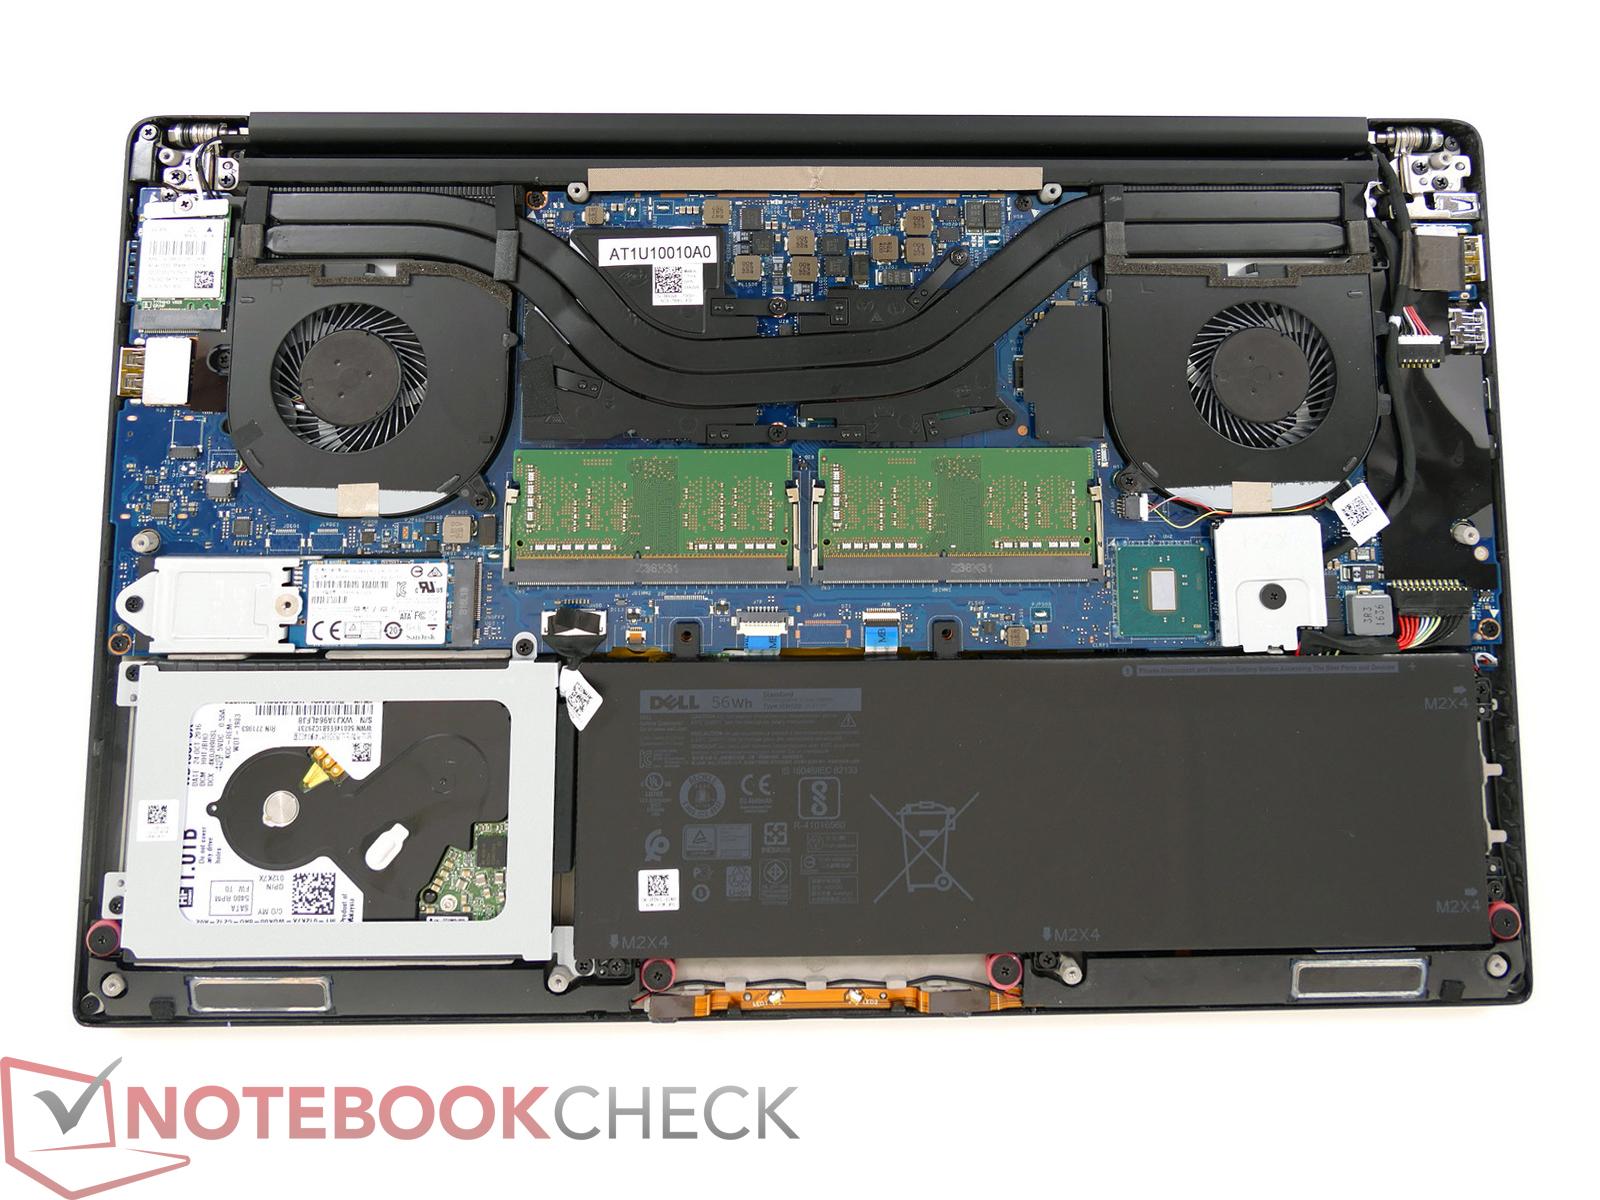 Laptop Mit 2 Festplatten Slots